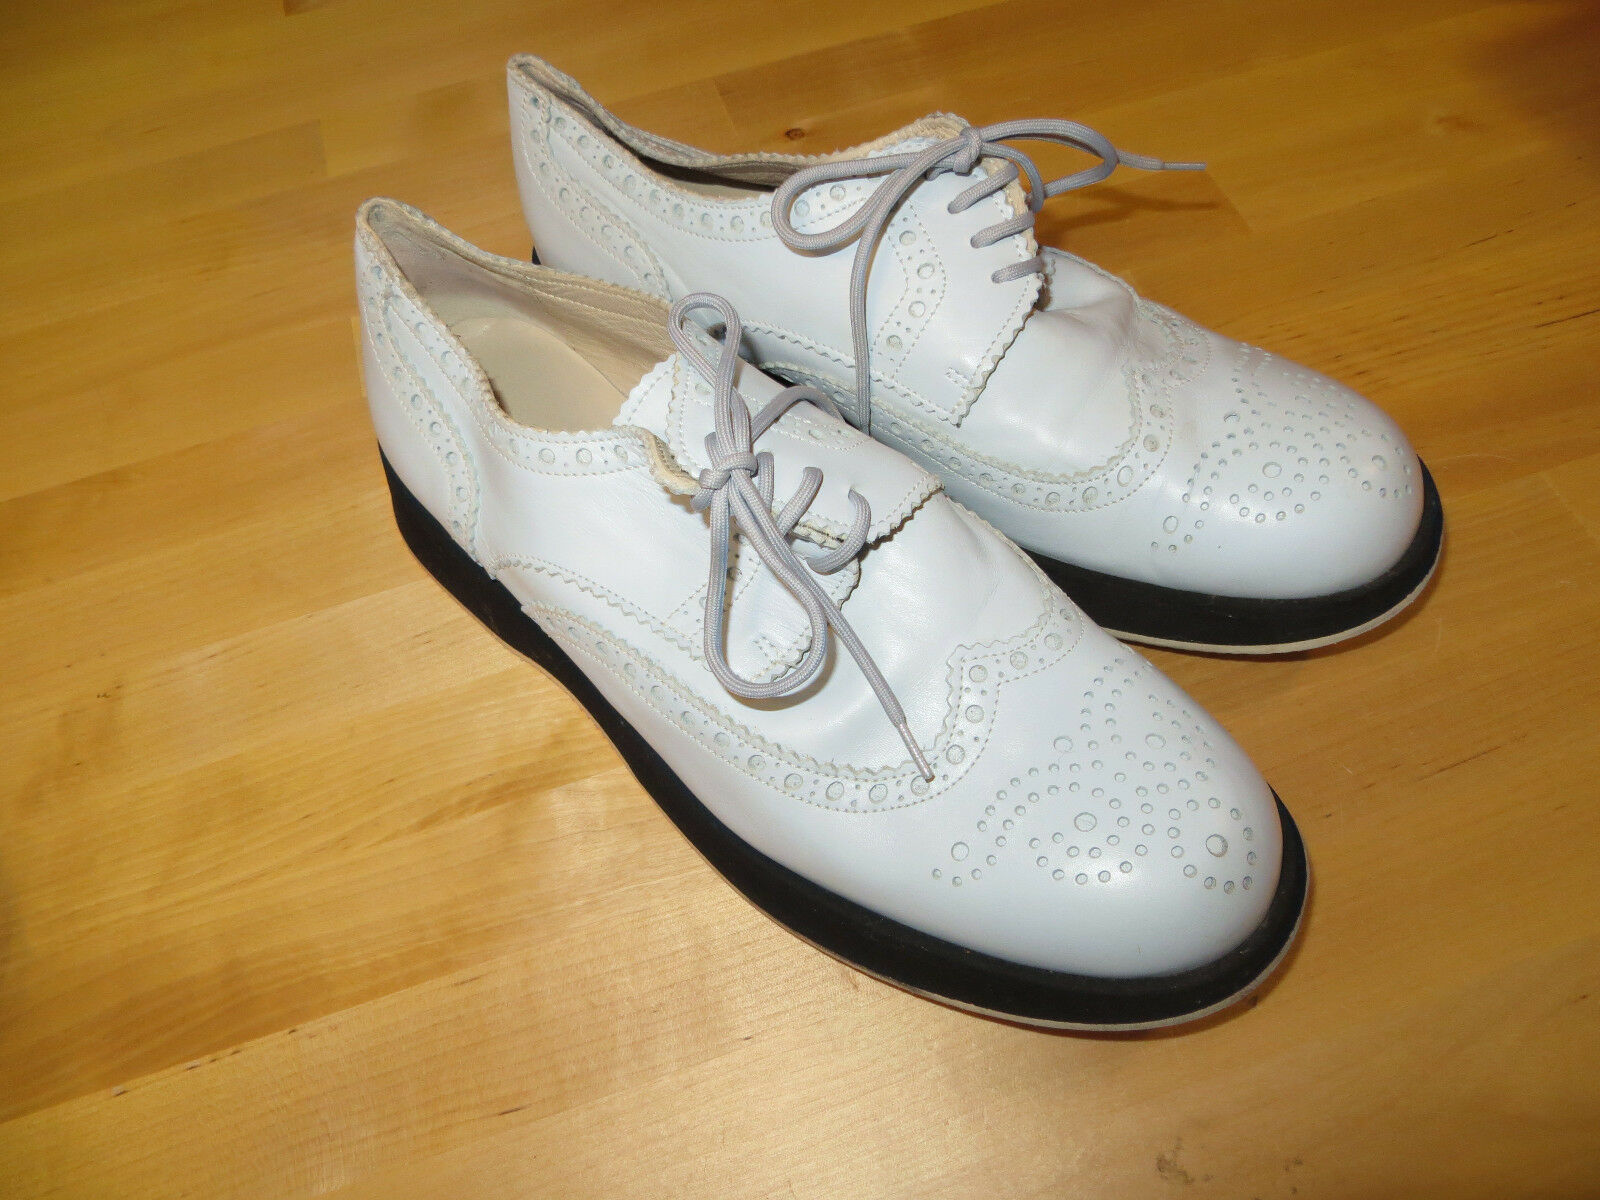 Mer du Sud Gr. 38 Leder Sneaker Halbschuhe Schnürer hellblau Leder 38 Vintagelook e0cd9f